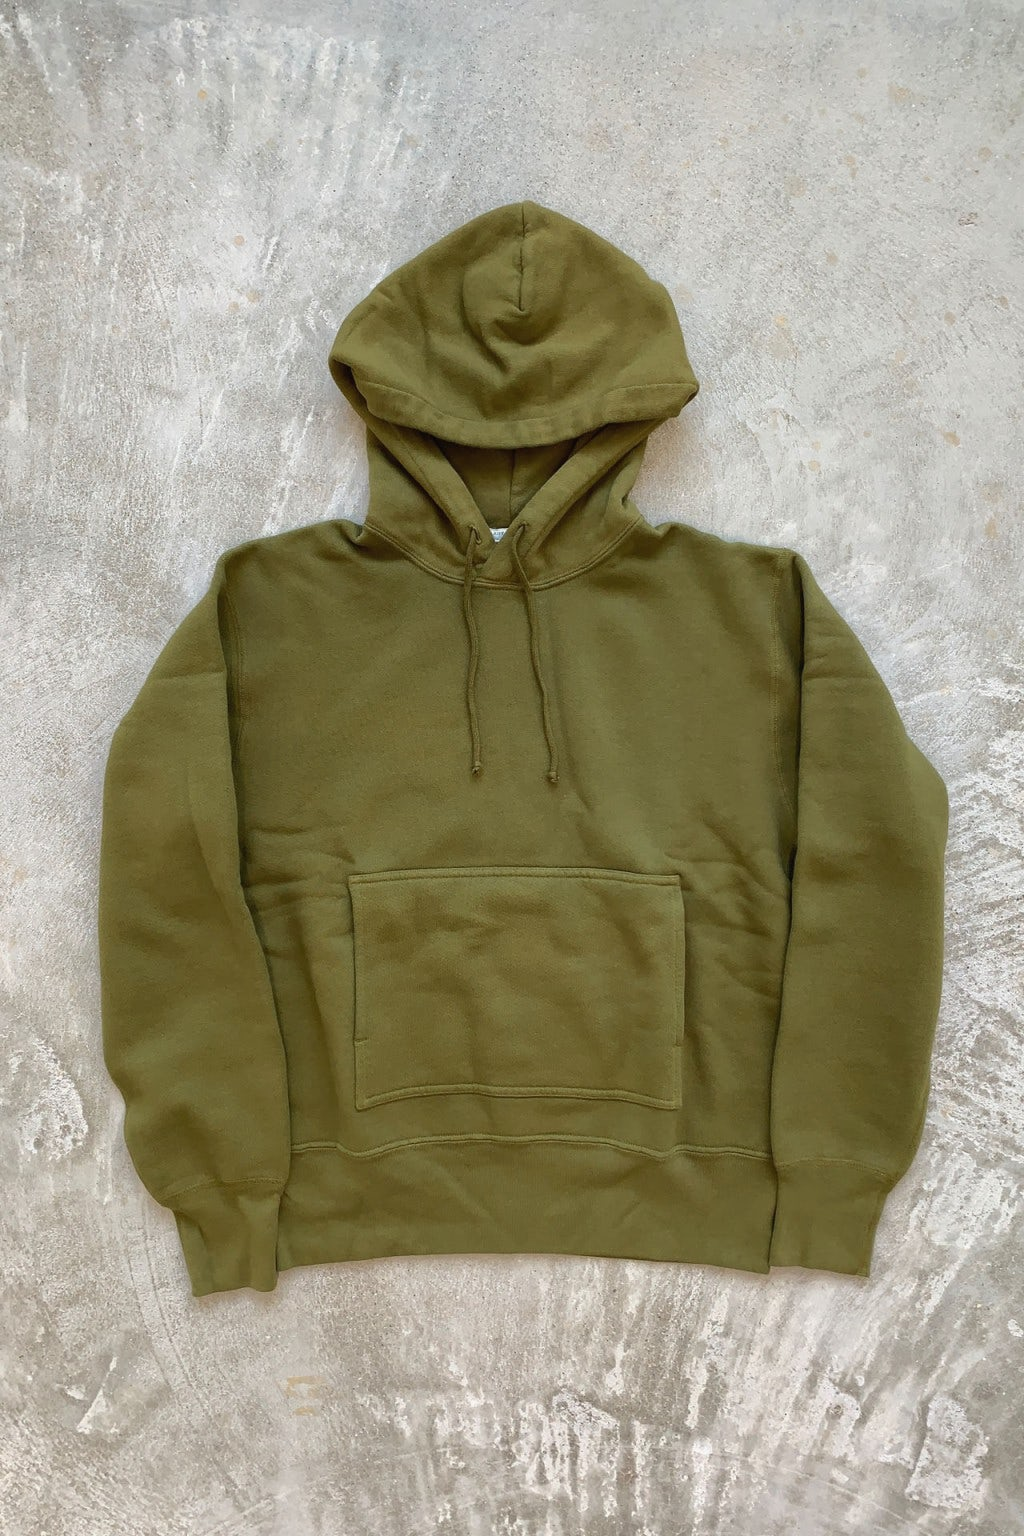 Lady White Co. Hoodie Fern Green Hooded Sweatshirt